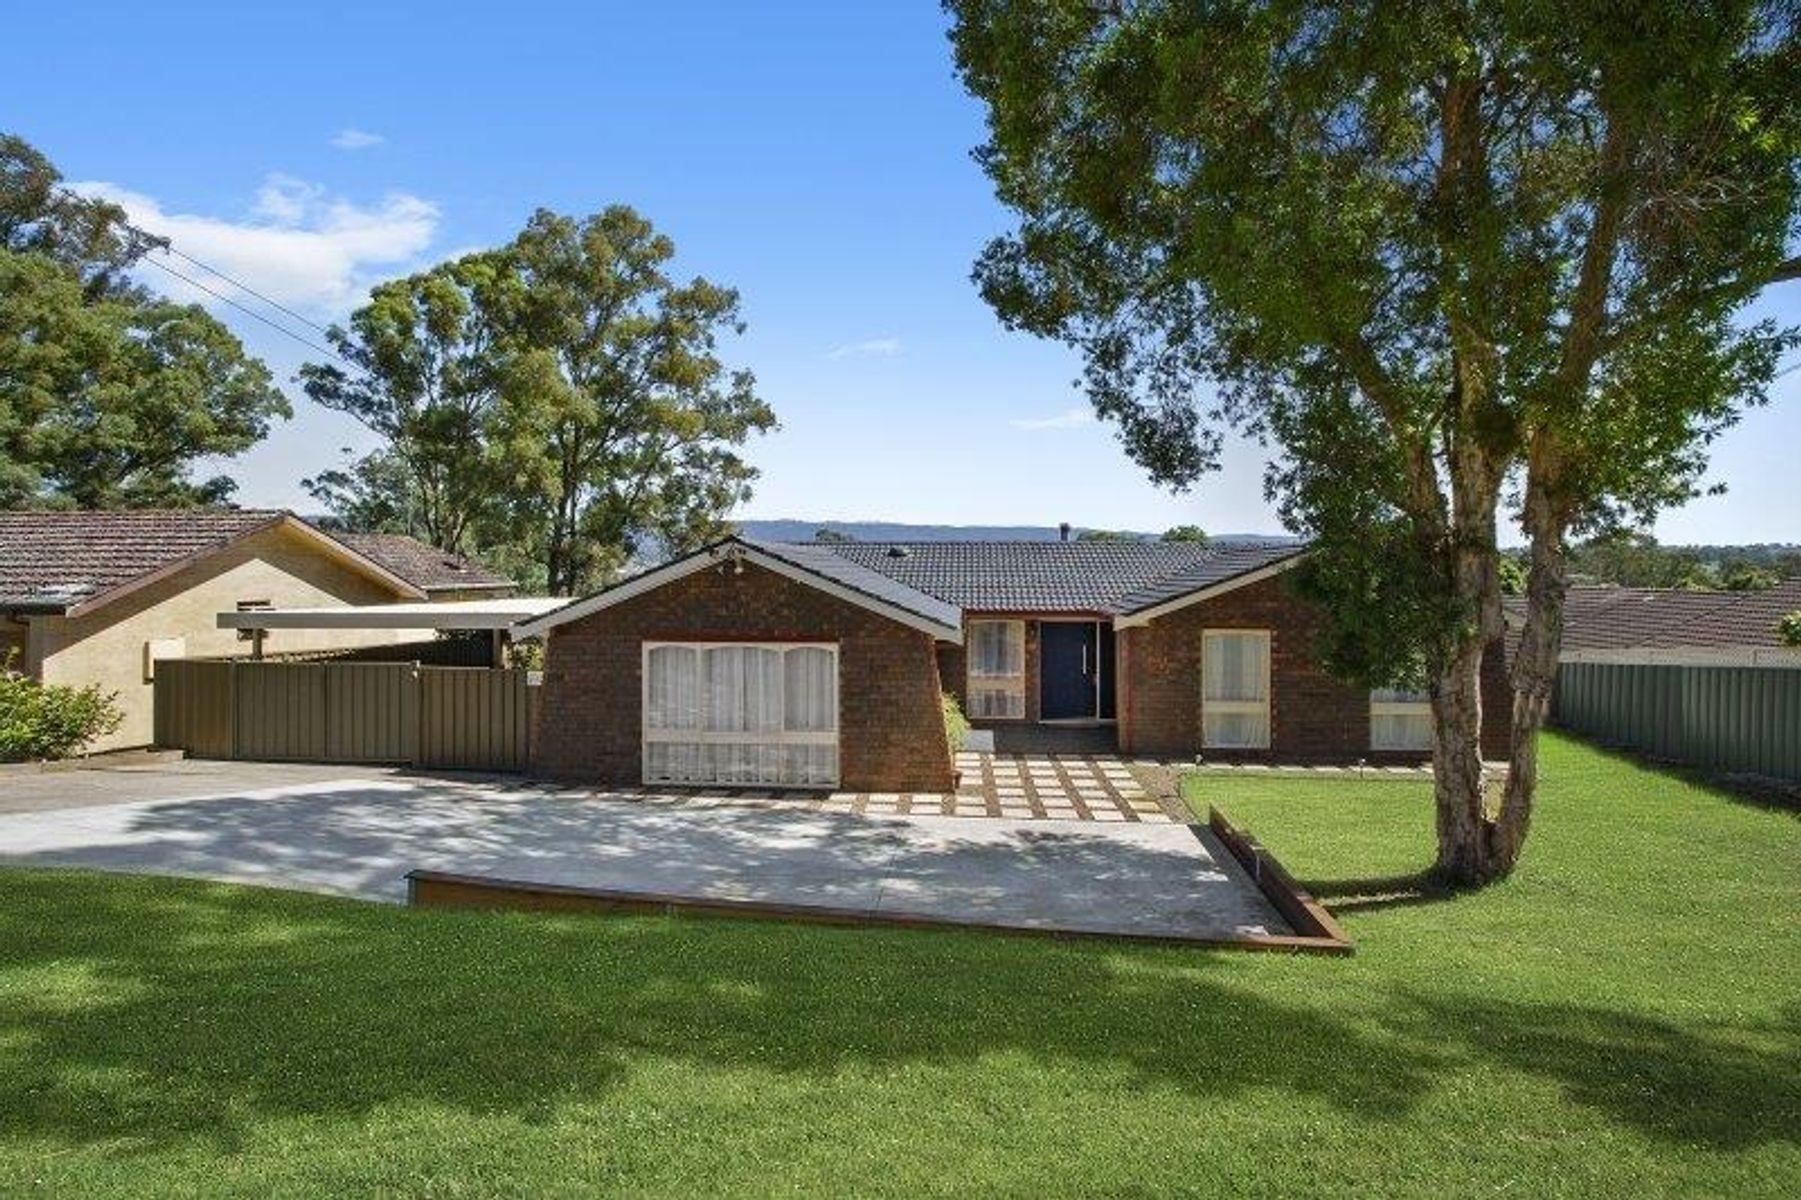 92 Grose Vale Rd, North Richmond, NSW 2754